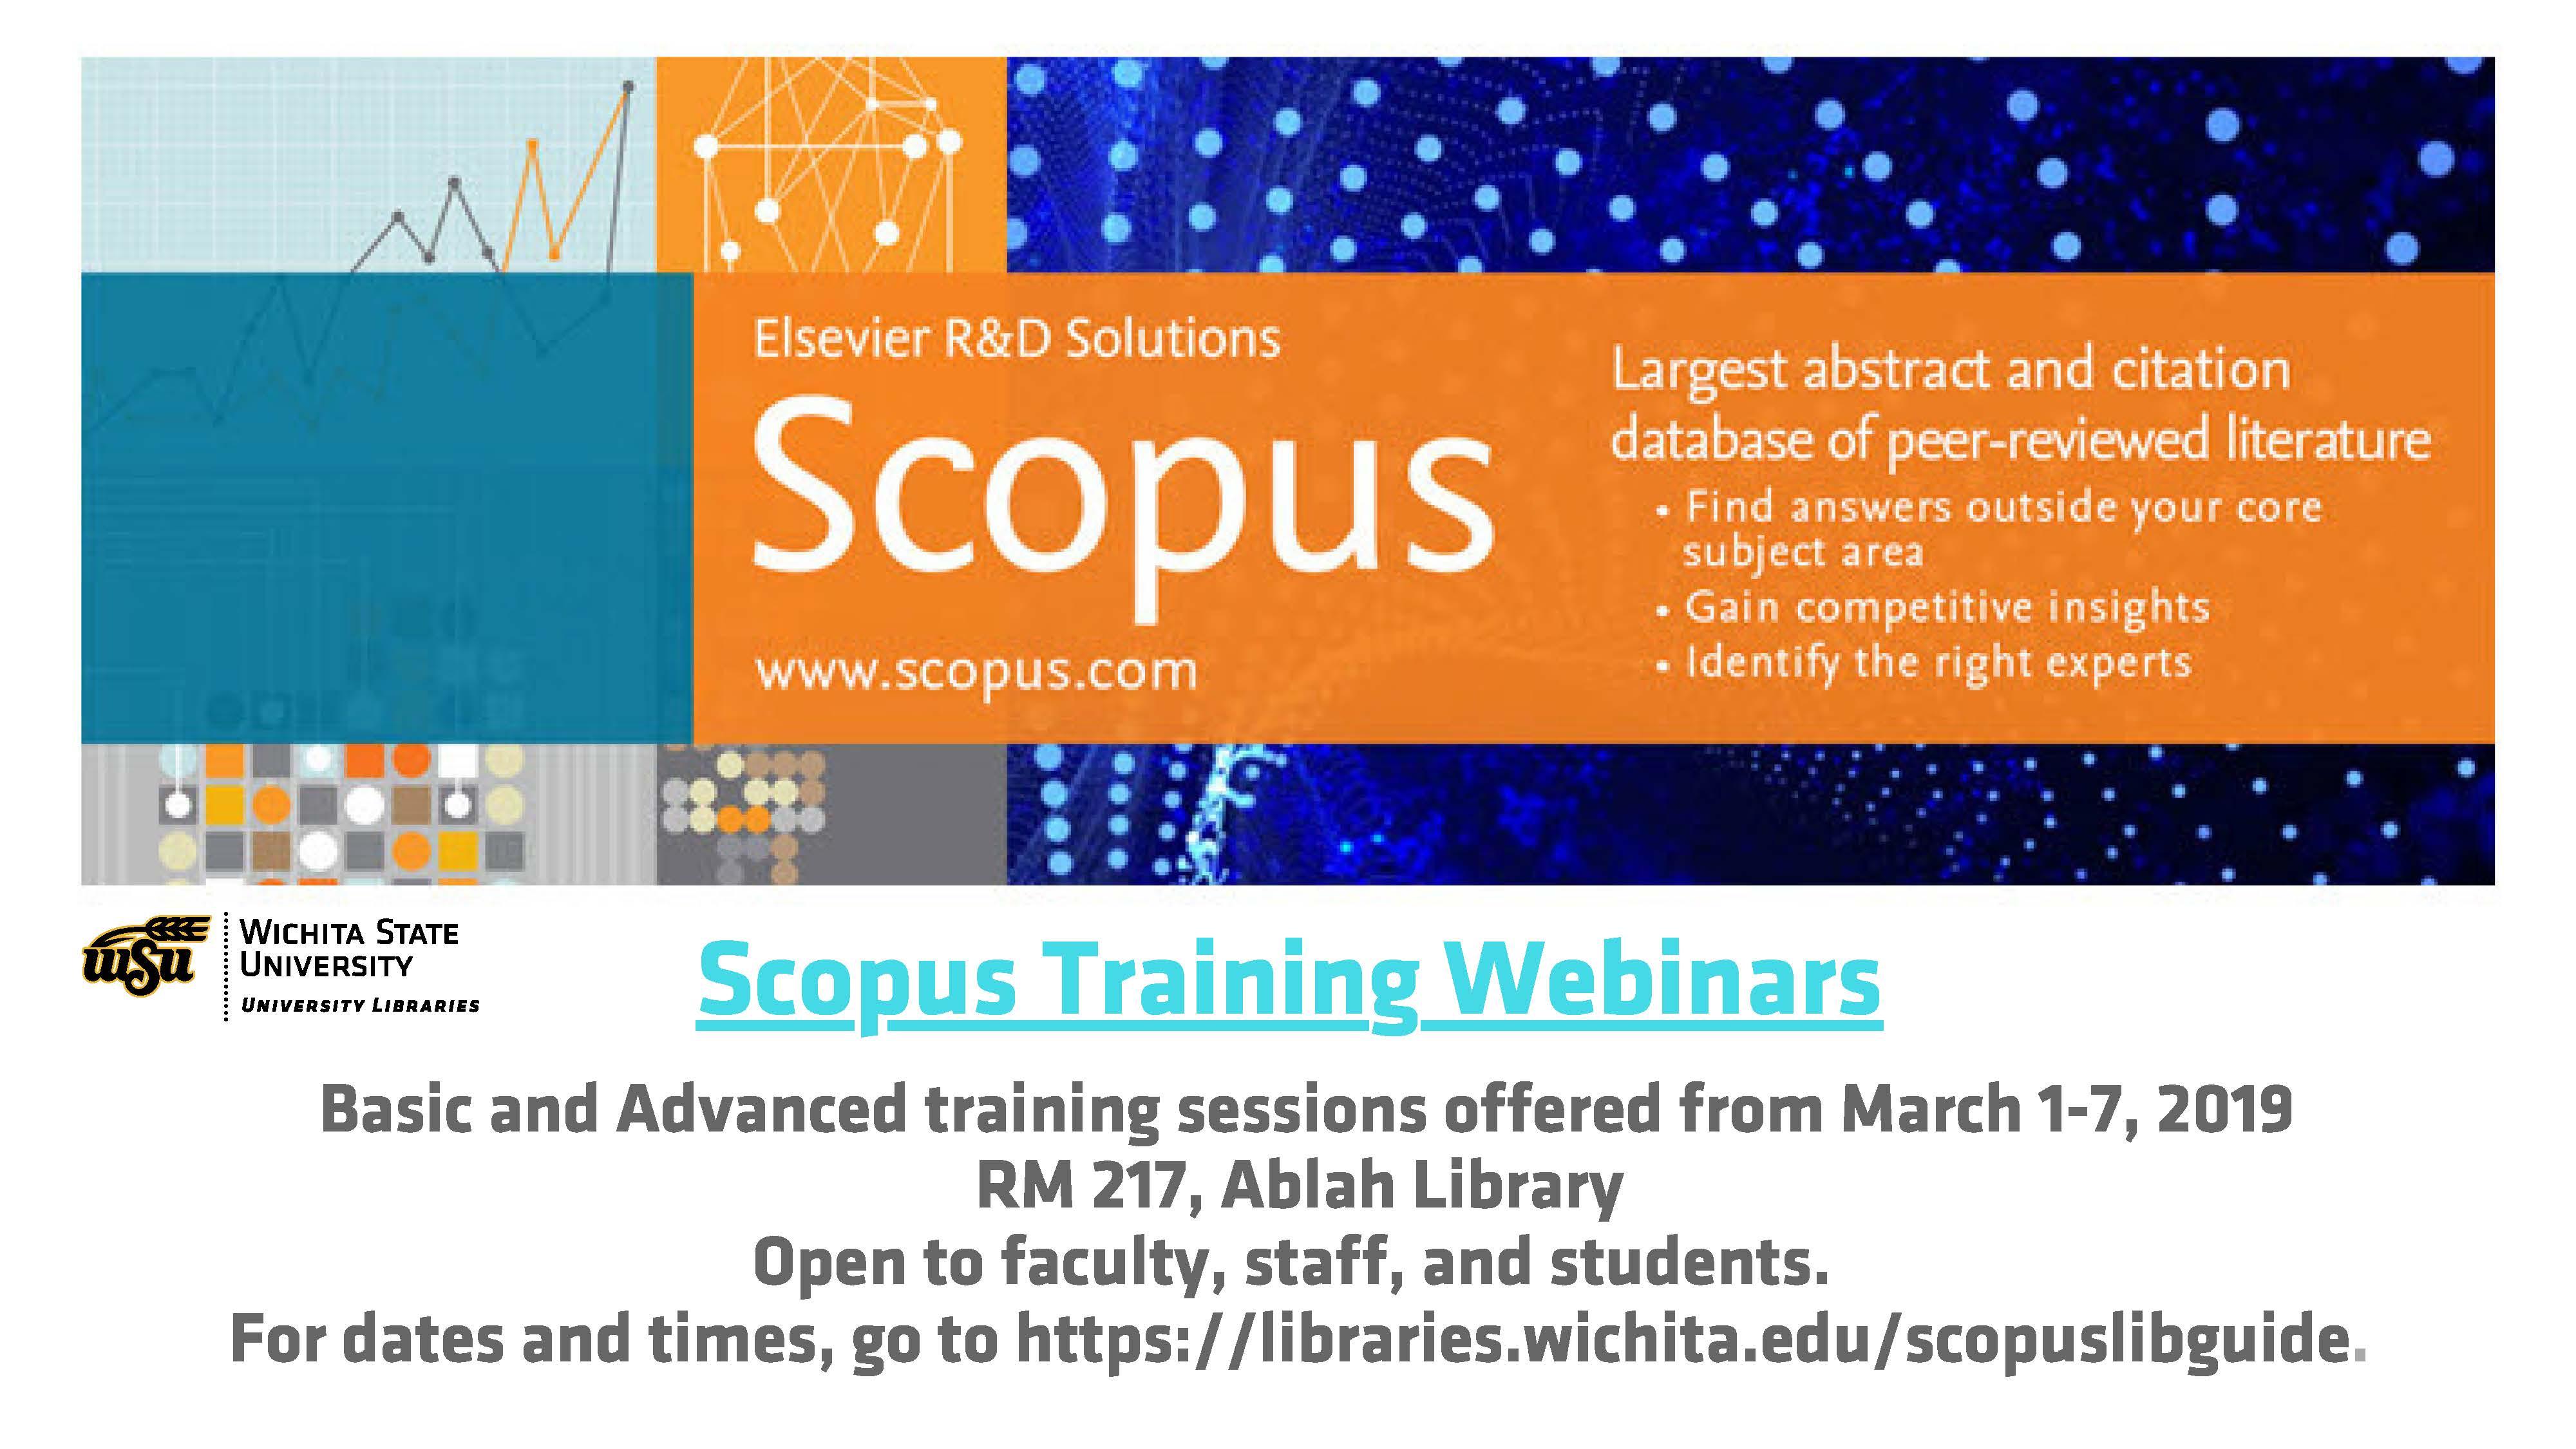 Scopus Webinar: Beyond the Basics